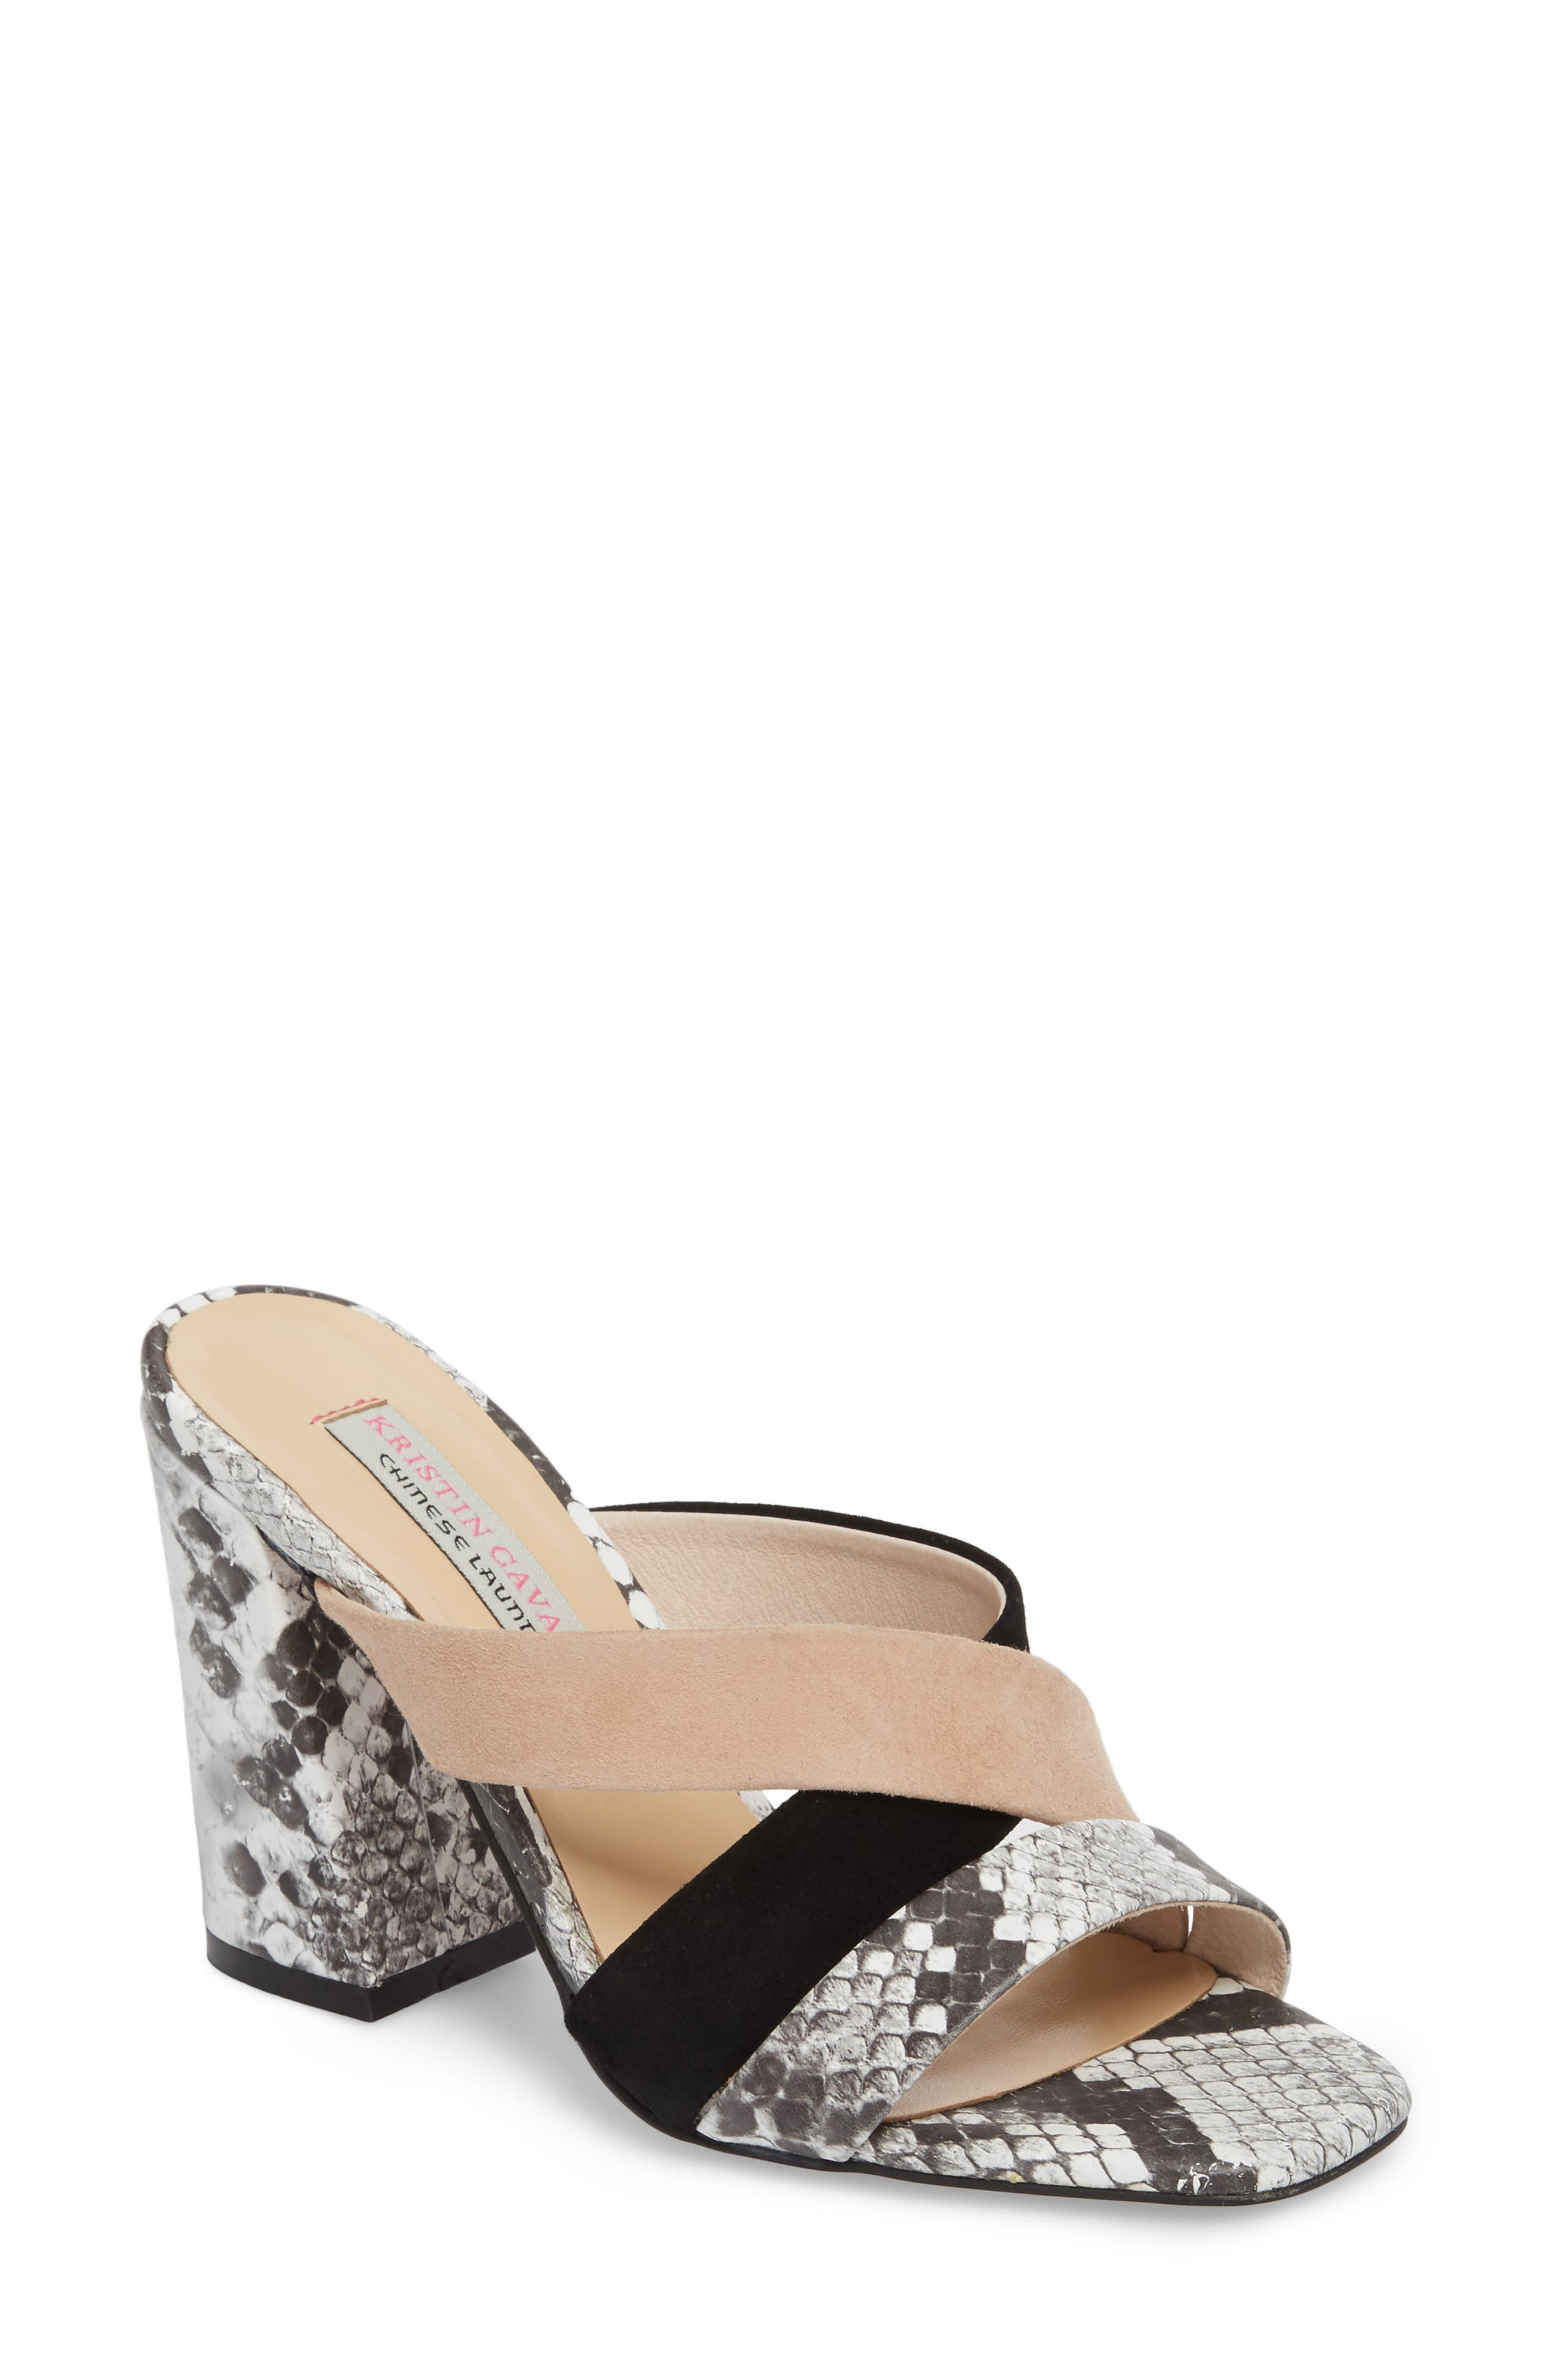 Lola Slide Sandal,                             Main thumbnail 1, color,                             Grey/ White Print Leather